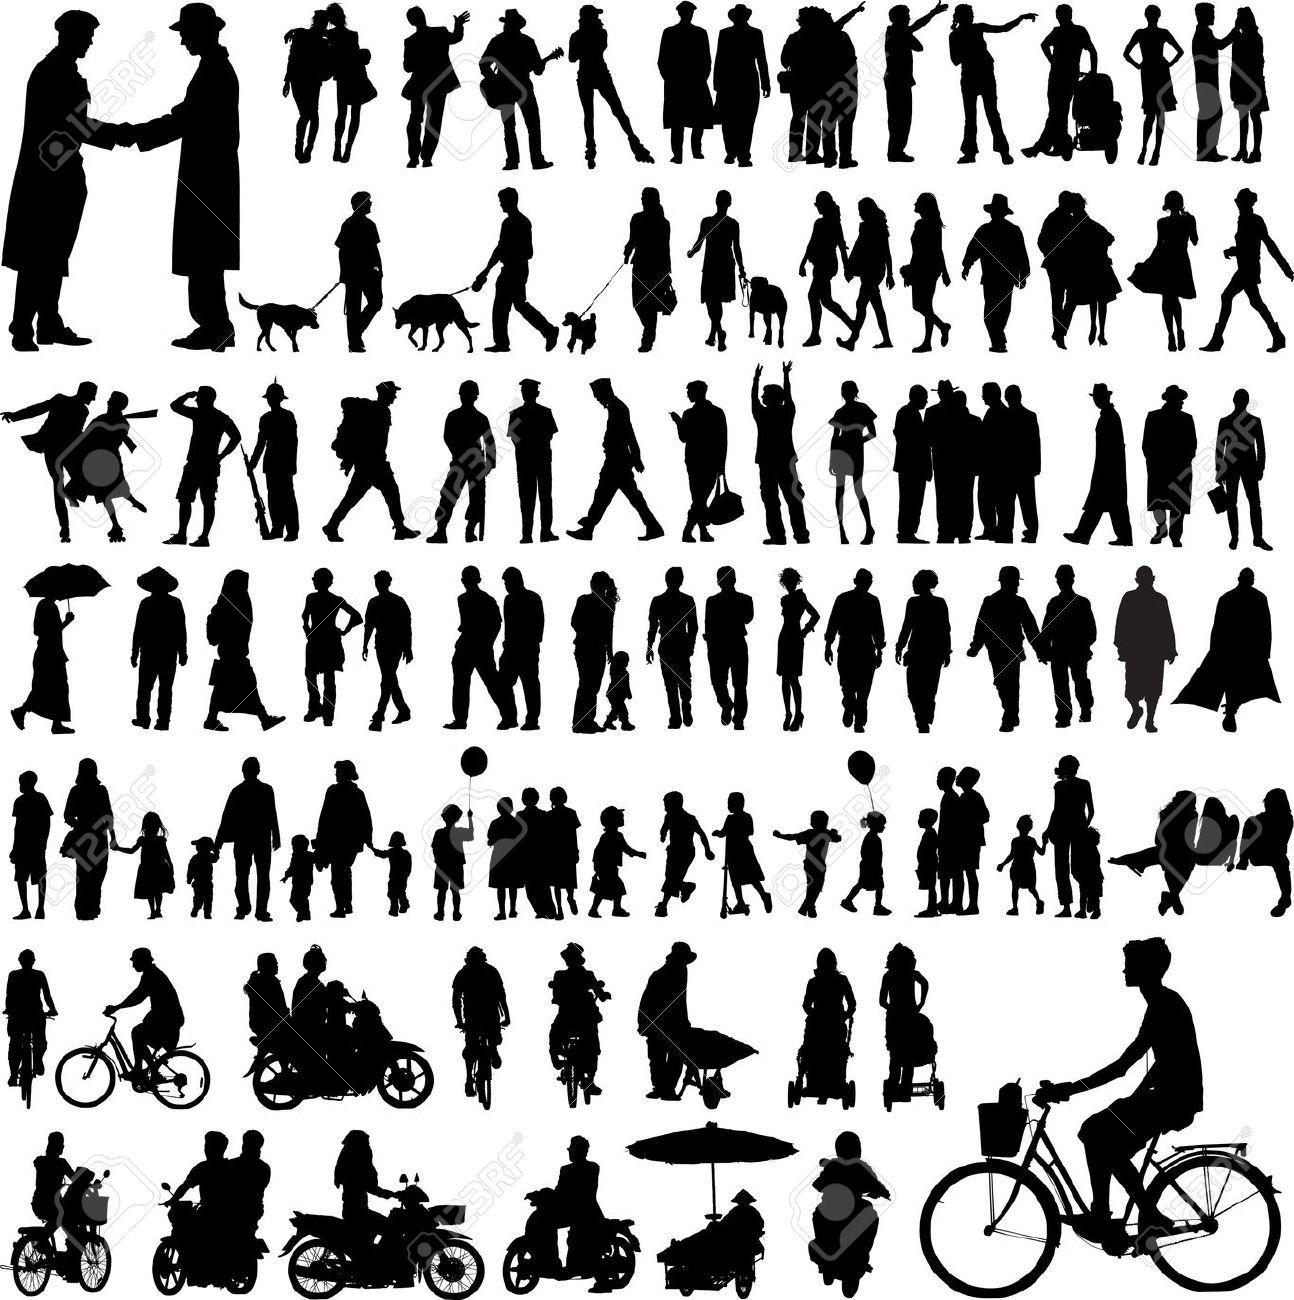 Human Figure Silhouette Google Search Architectural Model